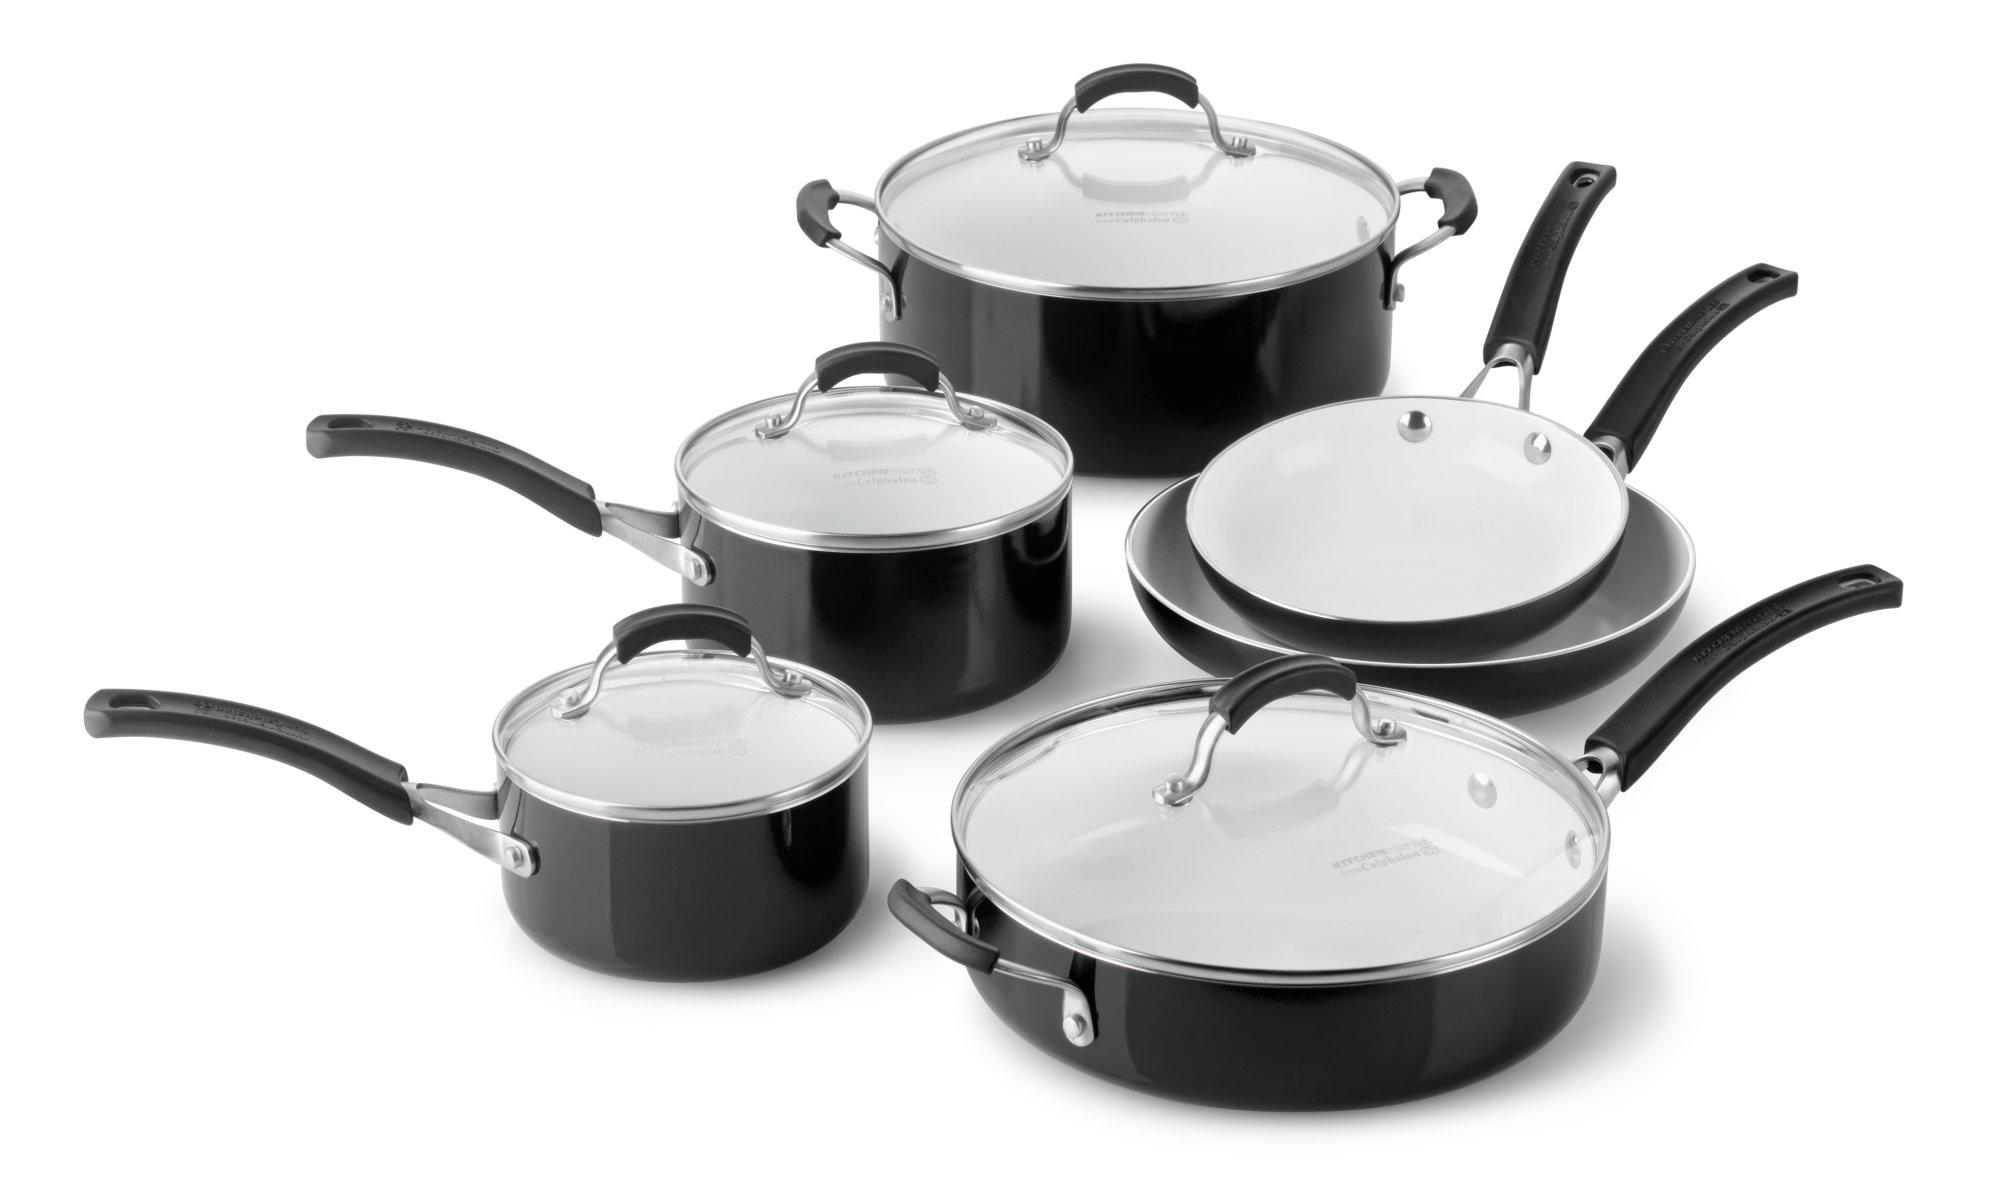 Calphalon Kitchen Essentials Ceramic Nonstick 10-pc. Cookware Set ...